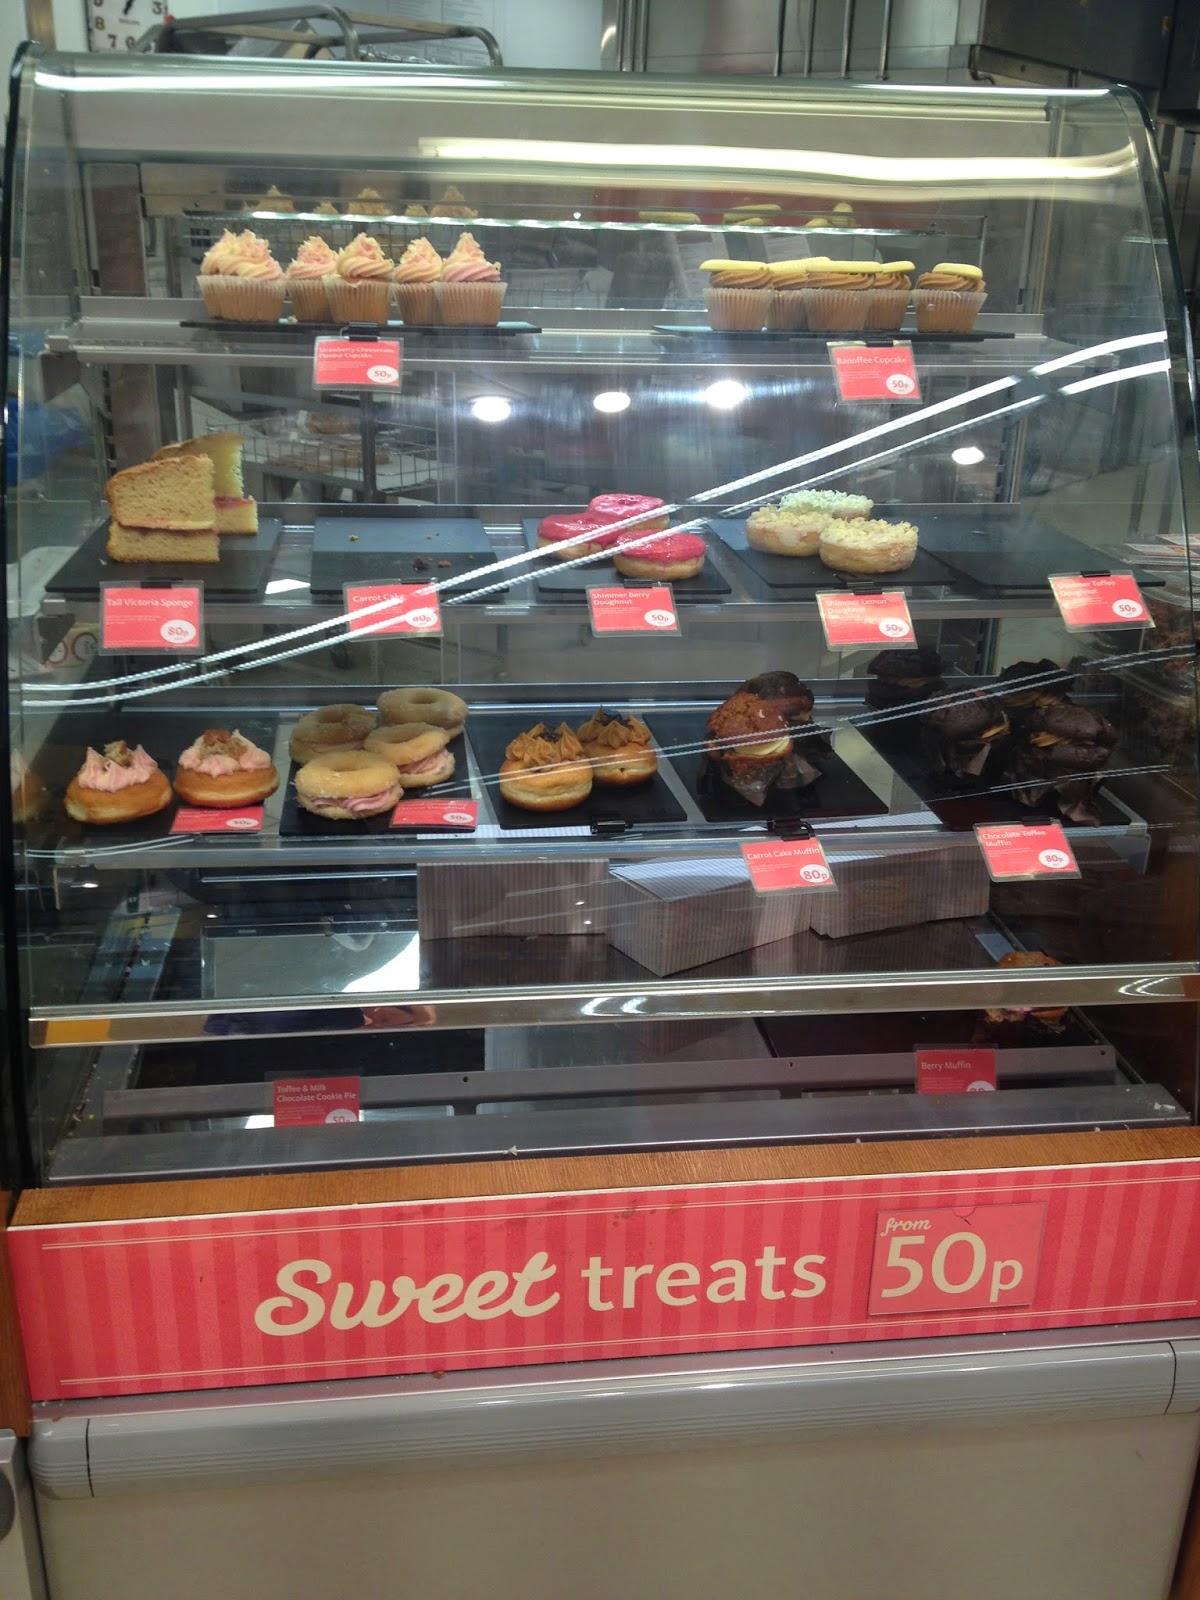 morrisons bakery counter